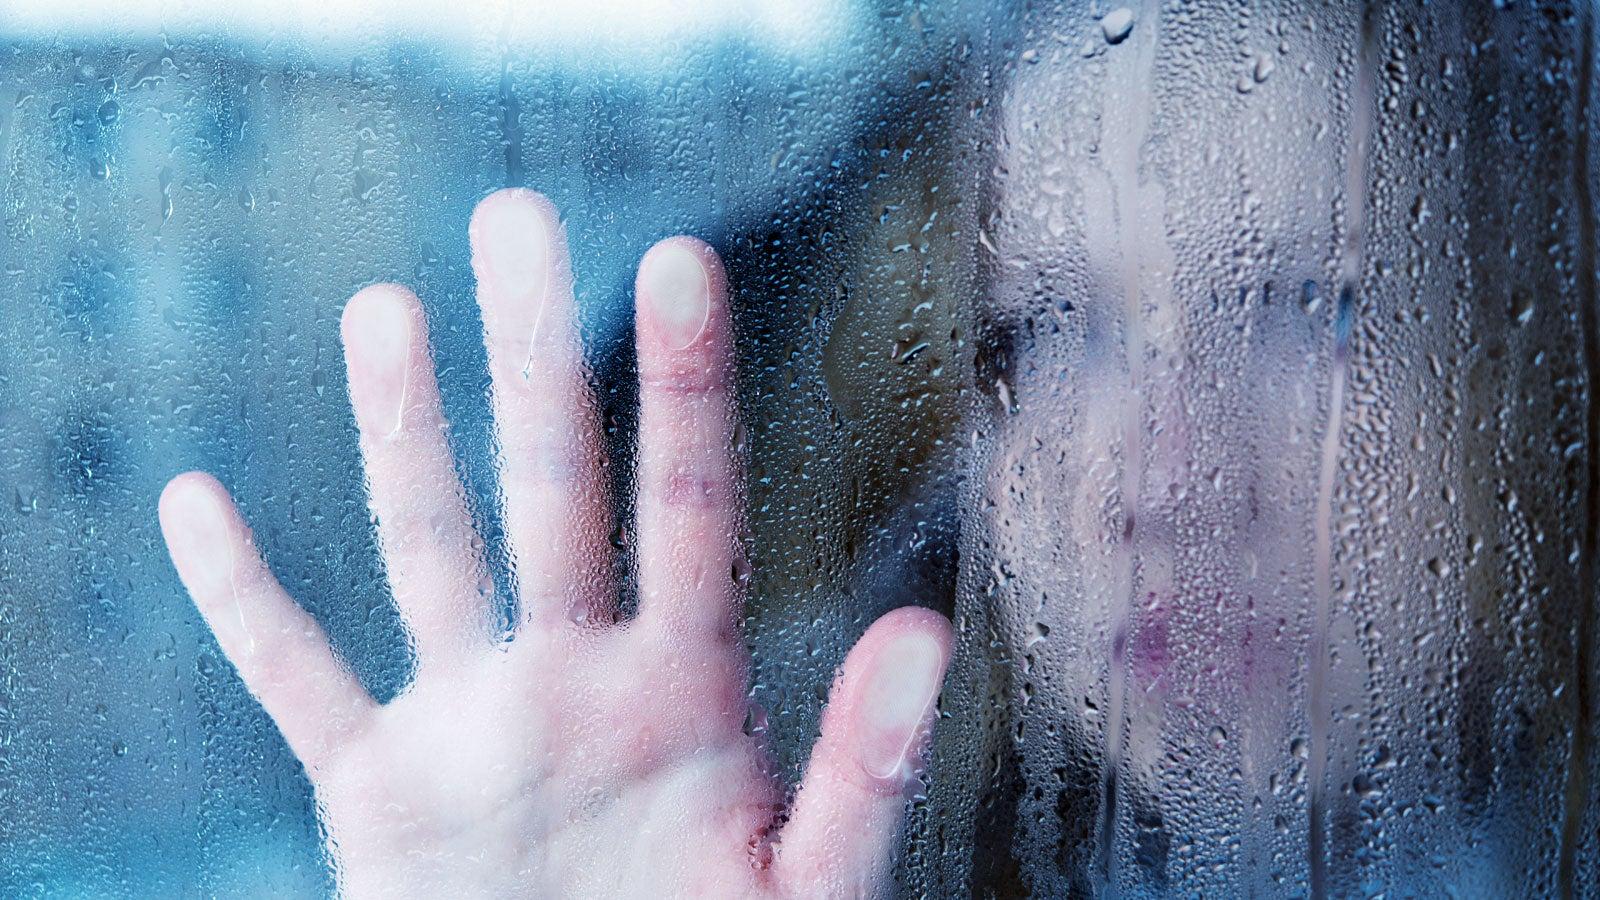 Seasonal Affective Disorder: Ten ways to help beat the winter blues